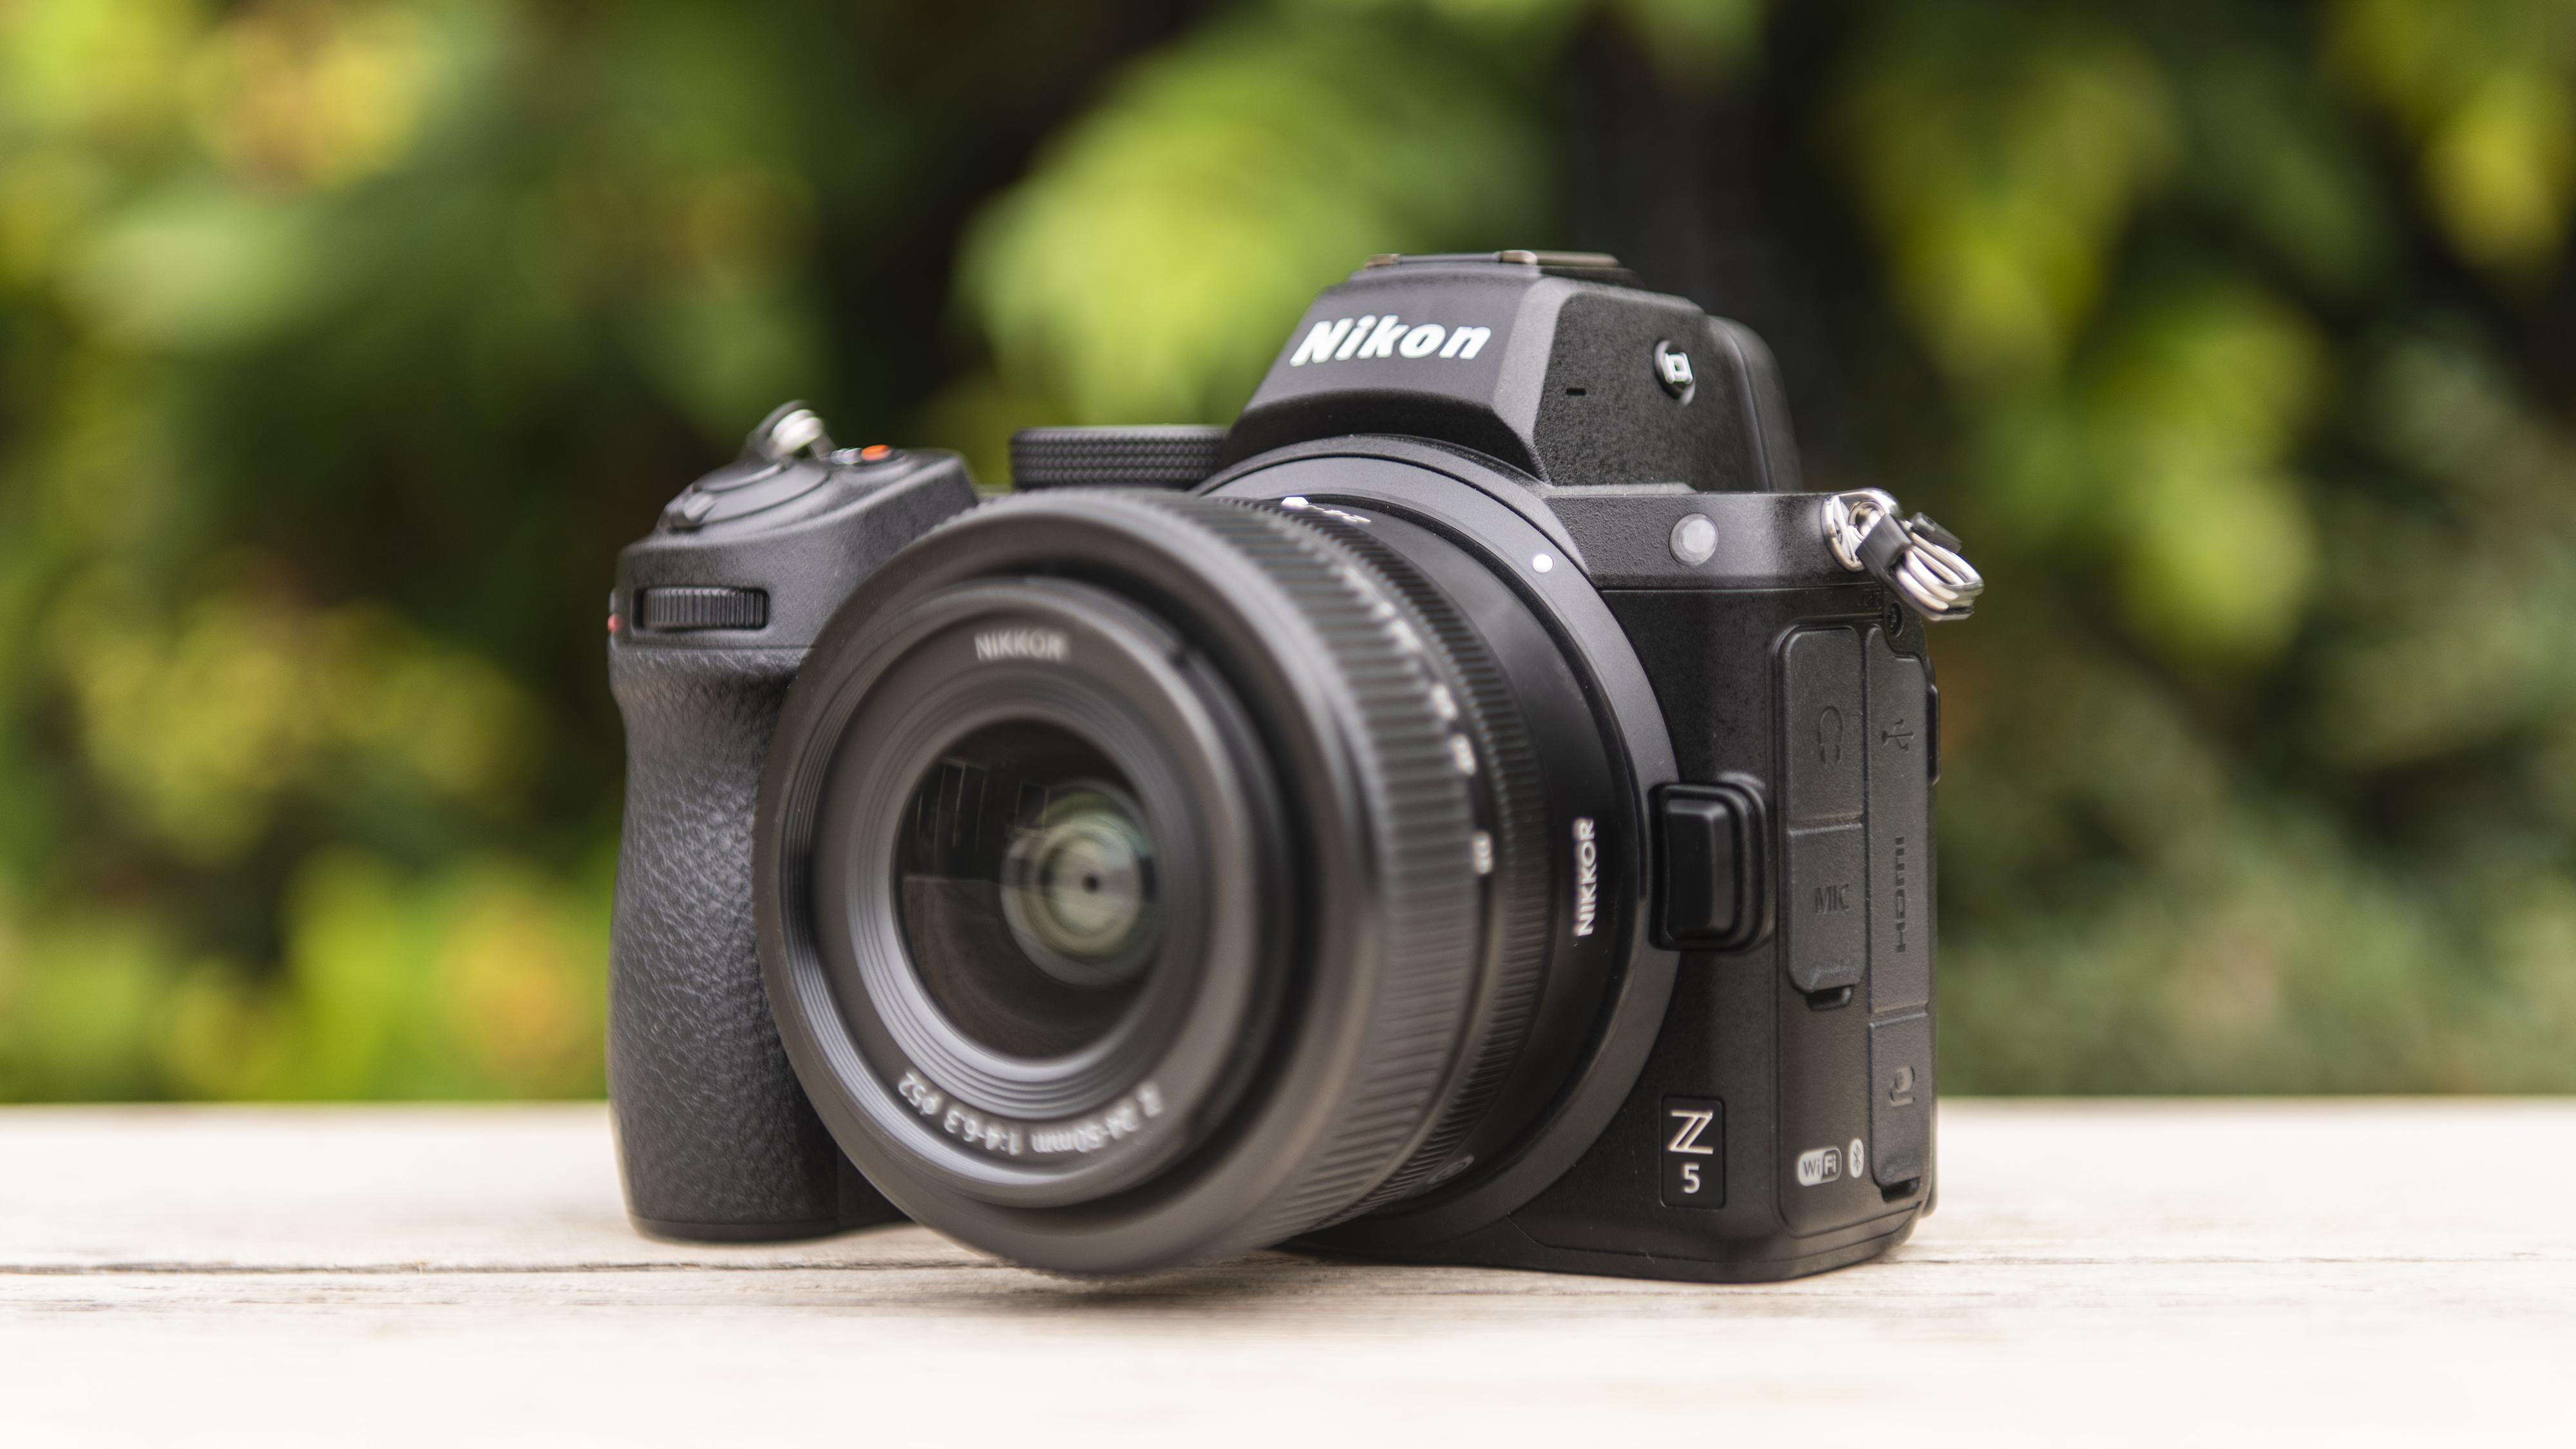 Best mirrorless camera 2020: the 14 best models on the planet | TechRadar